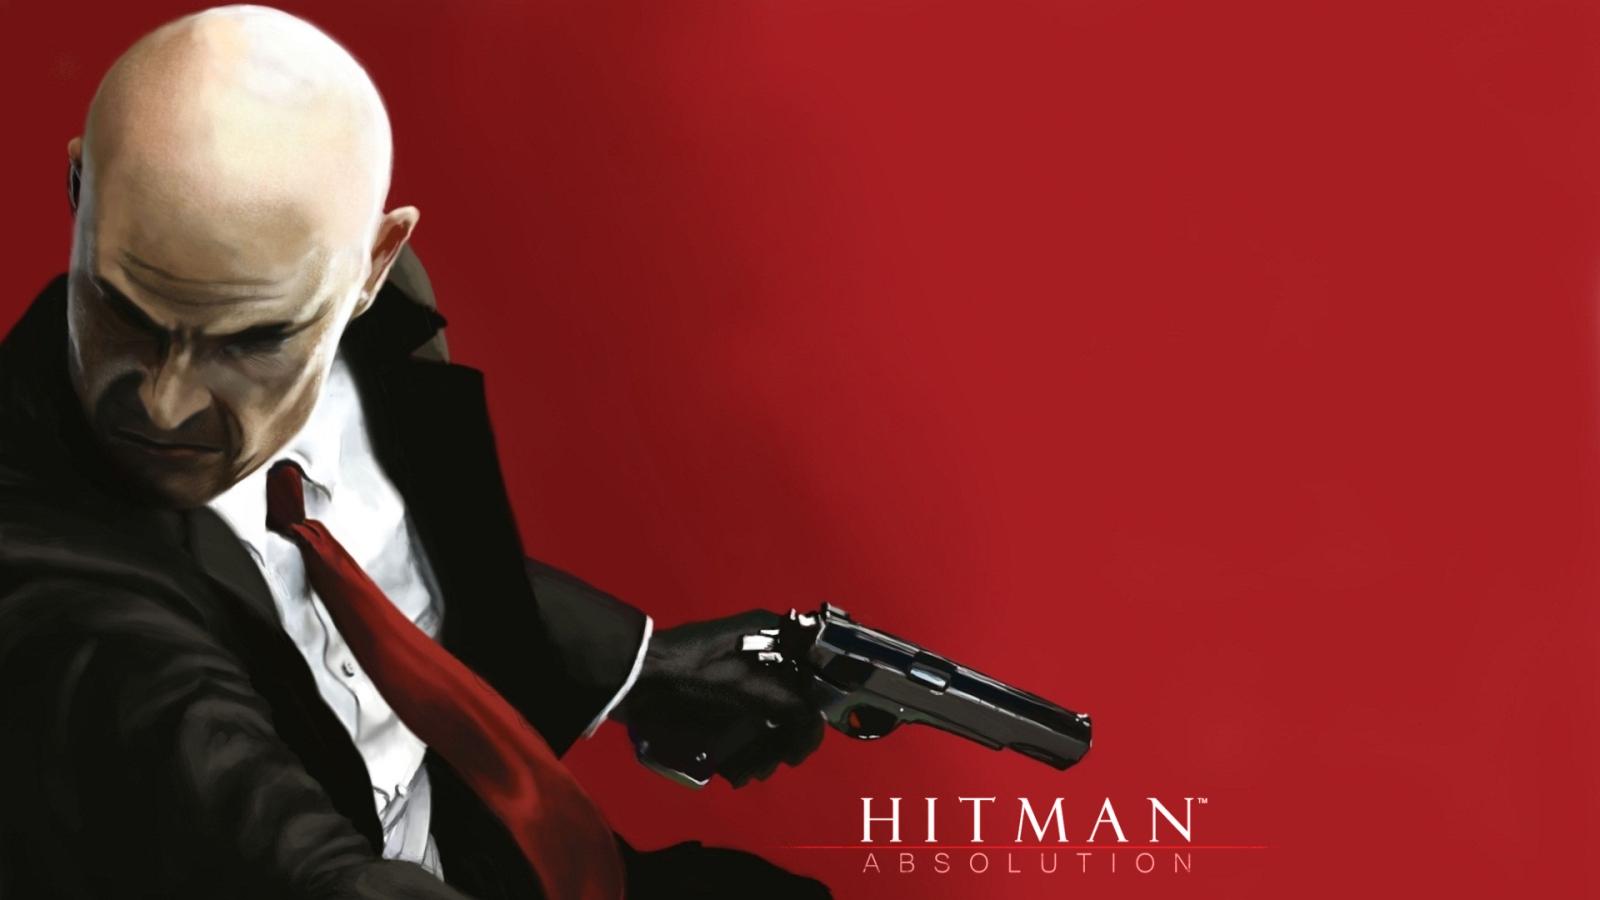 Hitman_Absolution_gameplay-screenshot-1